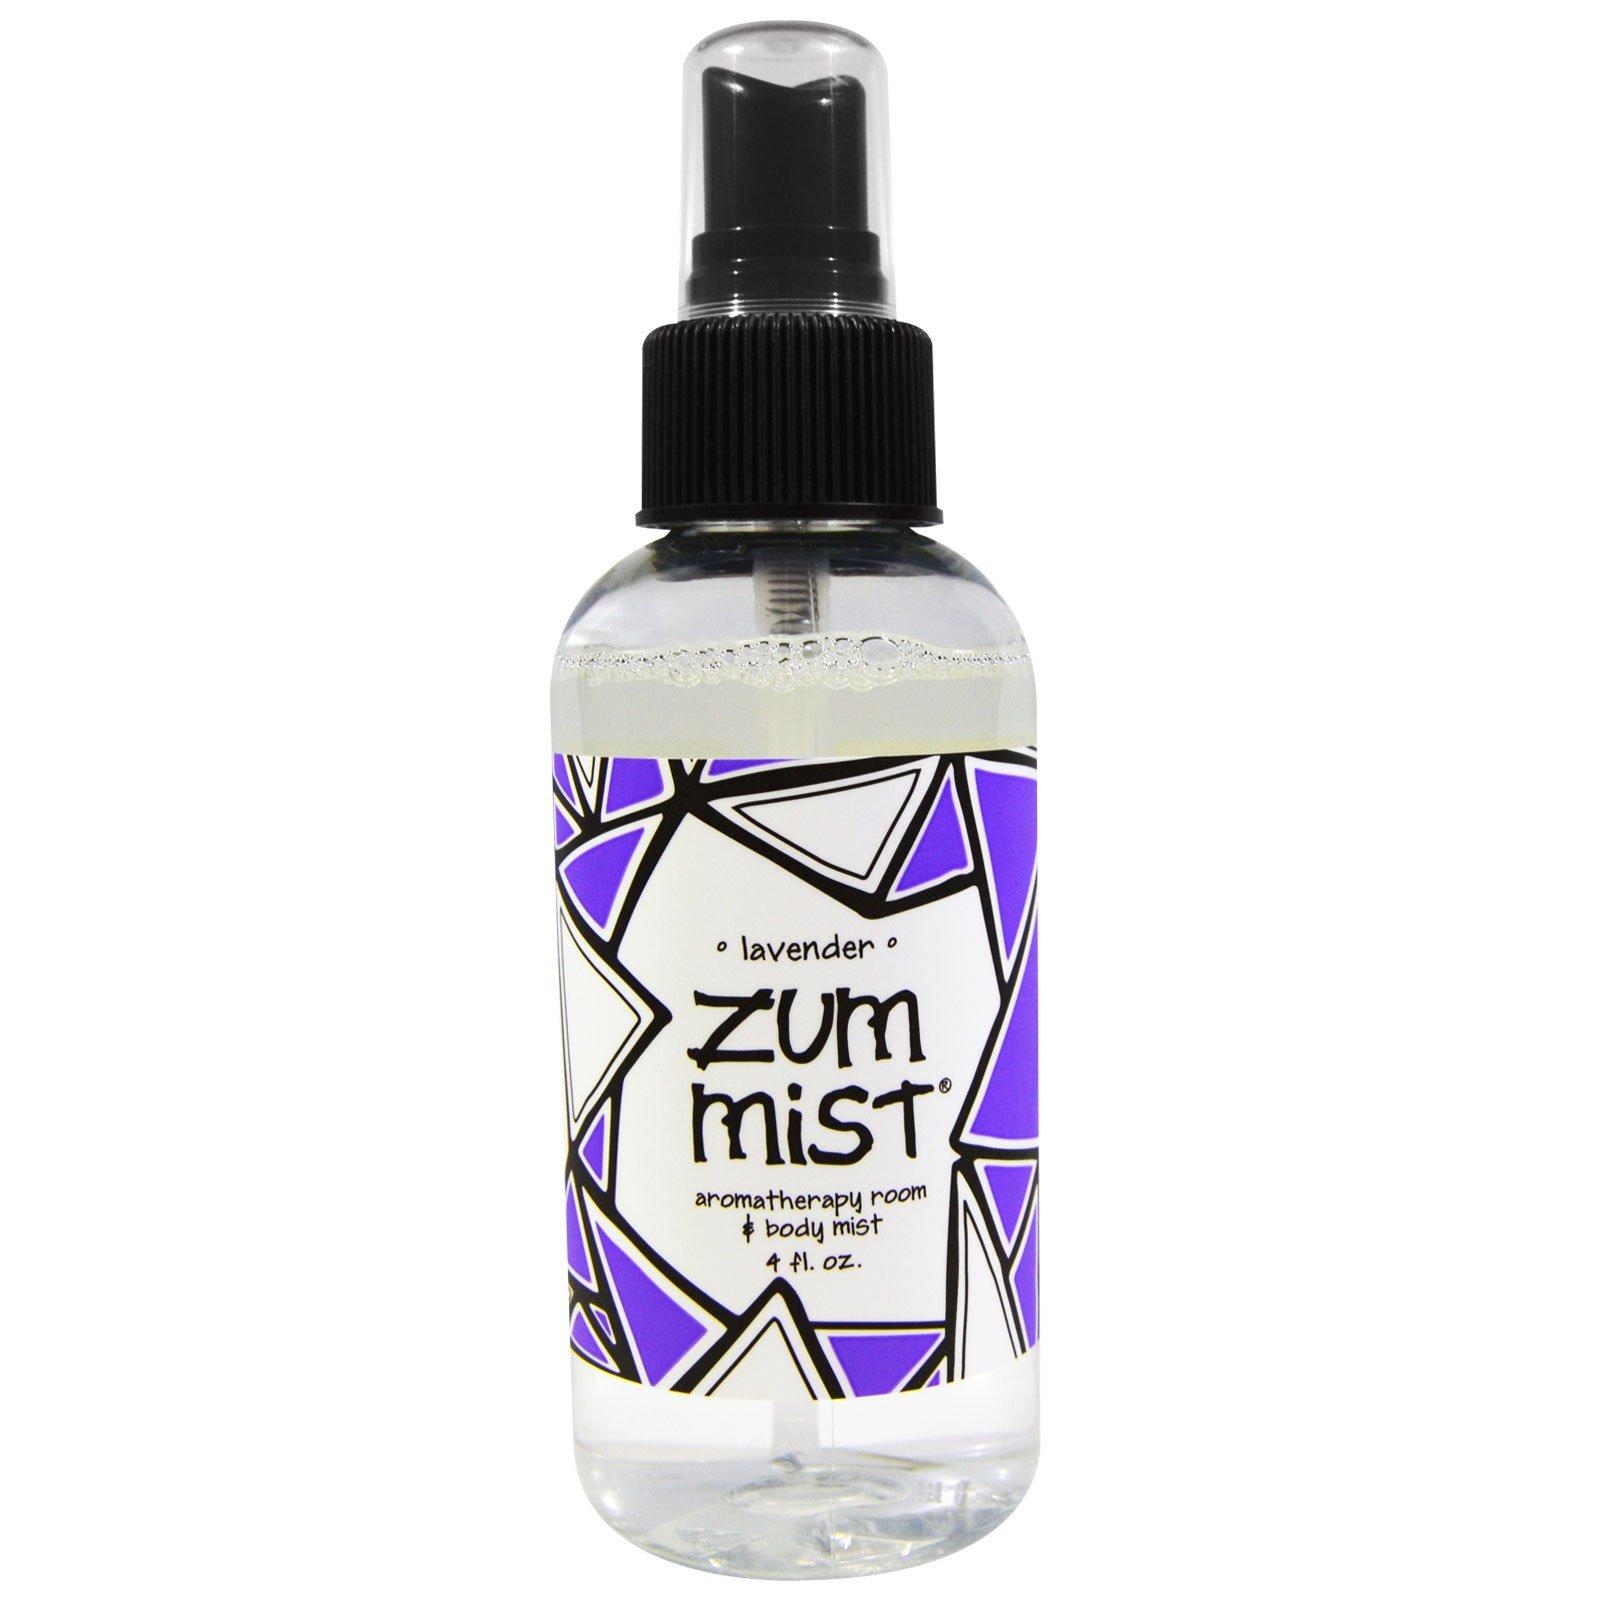 Indigo Wild, Zum Mist, ароматерапевтический аэрозоль для помещений и тела, лаванда, 4 жидкие унции